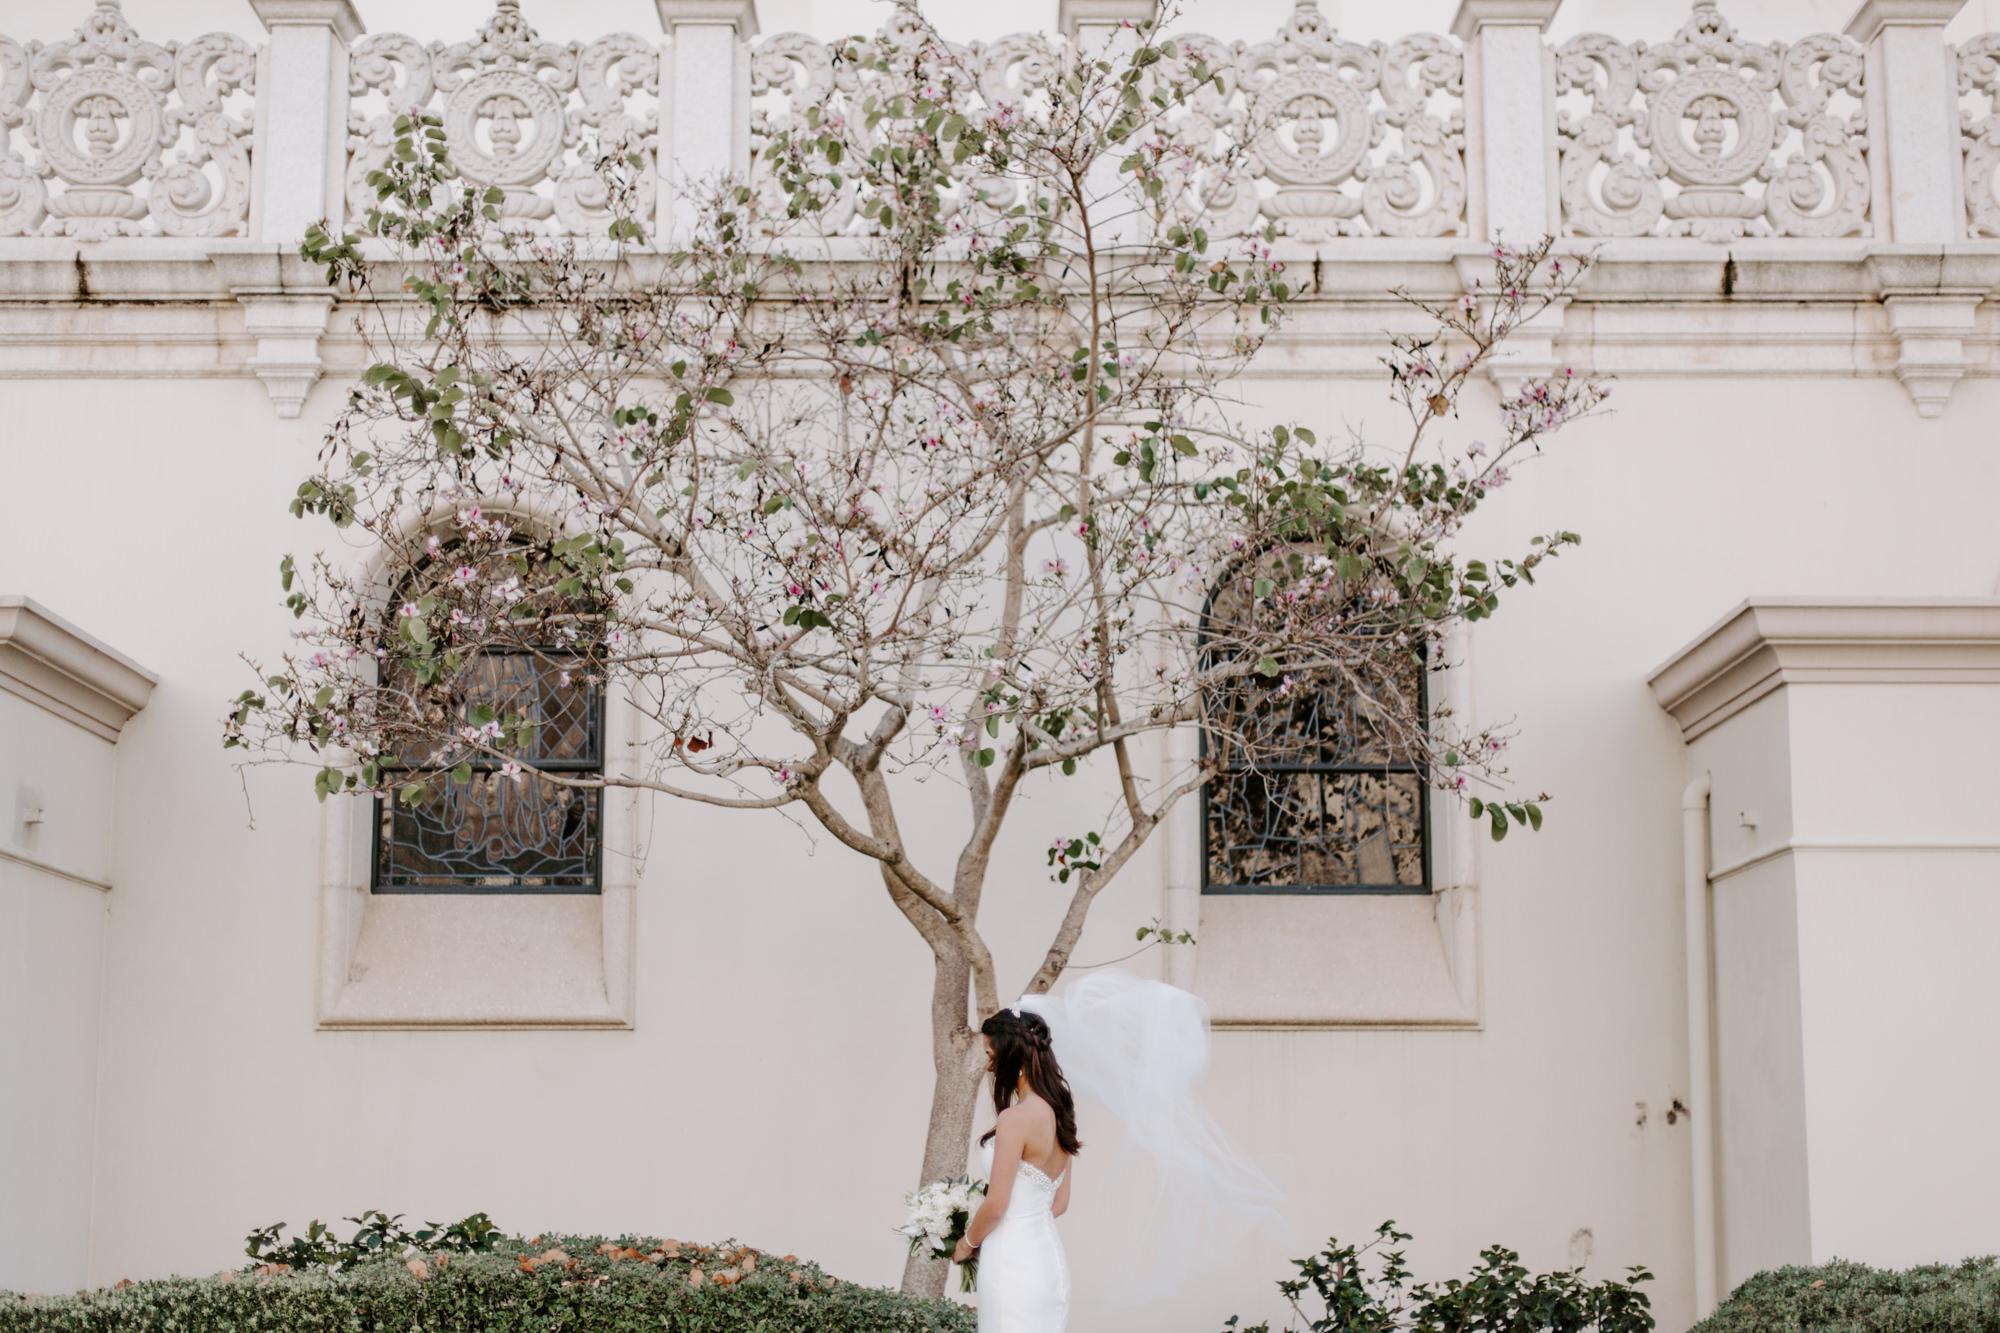 San Diego wedding photography at USD Immaculata 034.jpg